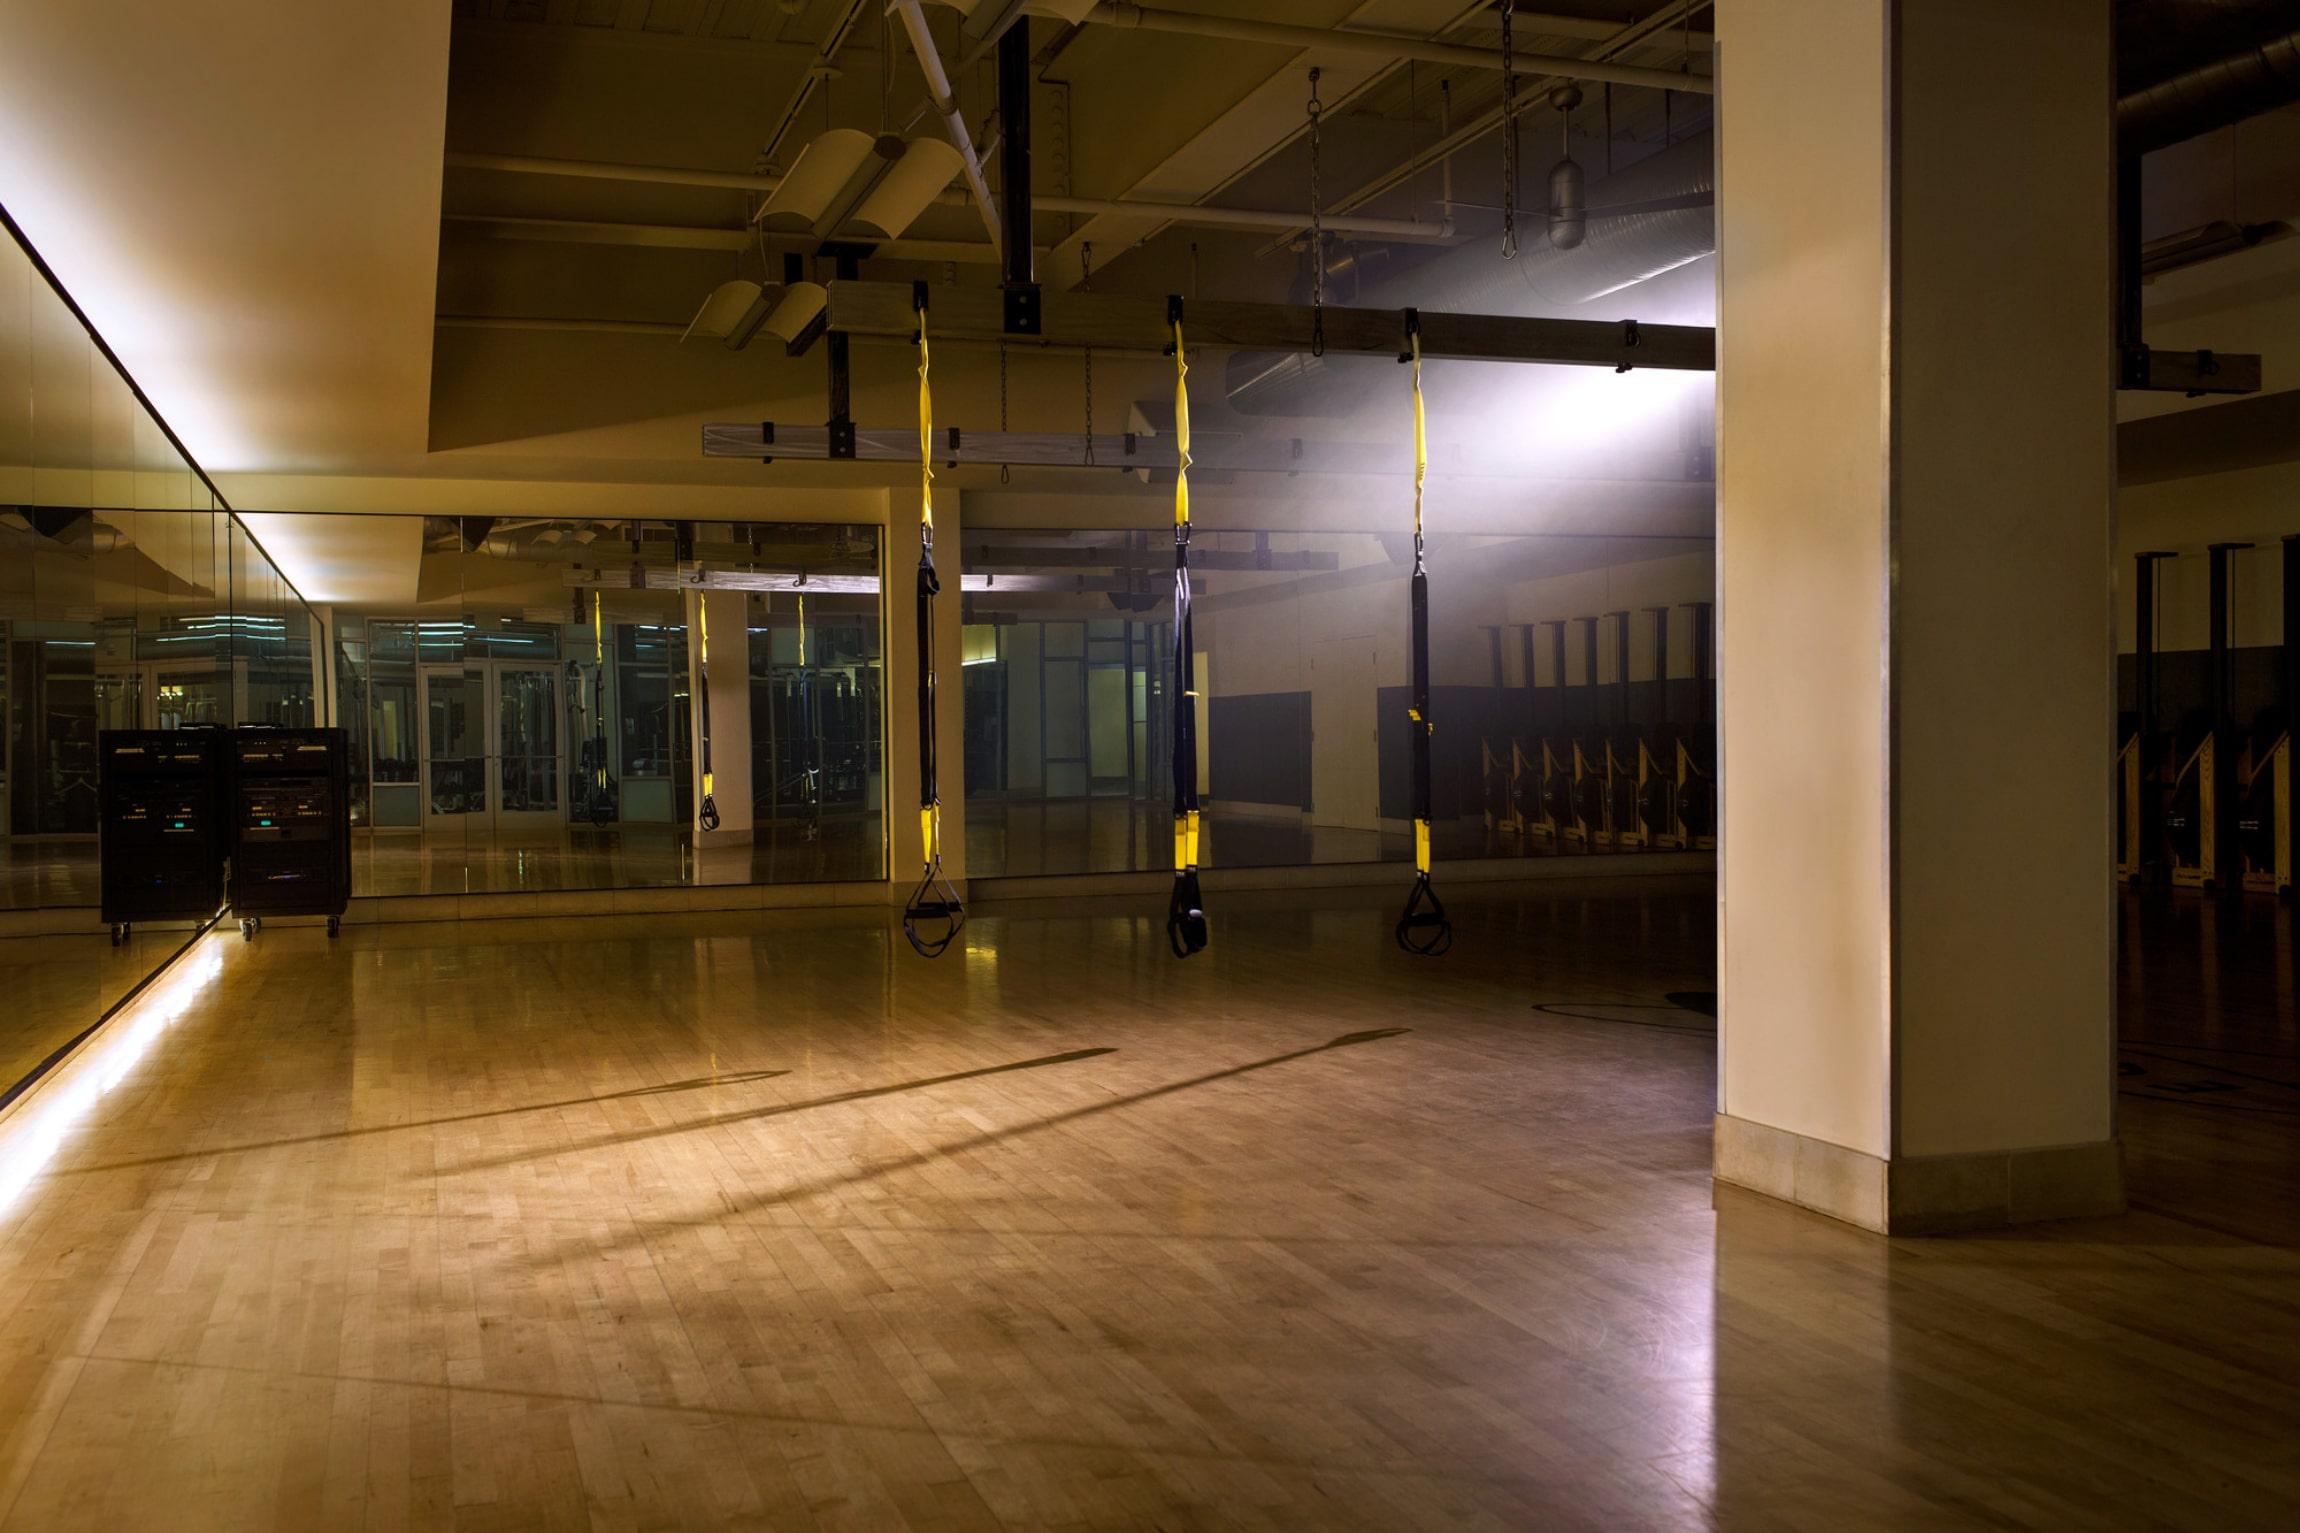 east 61st street fitness club equinox east 61st street fitness club equinox